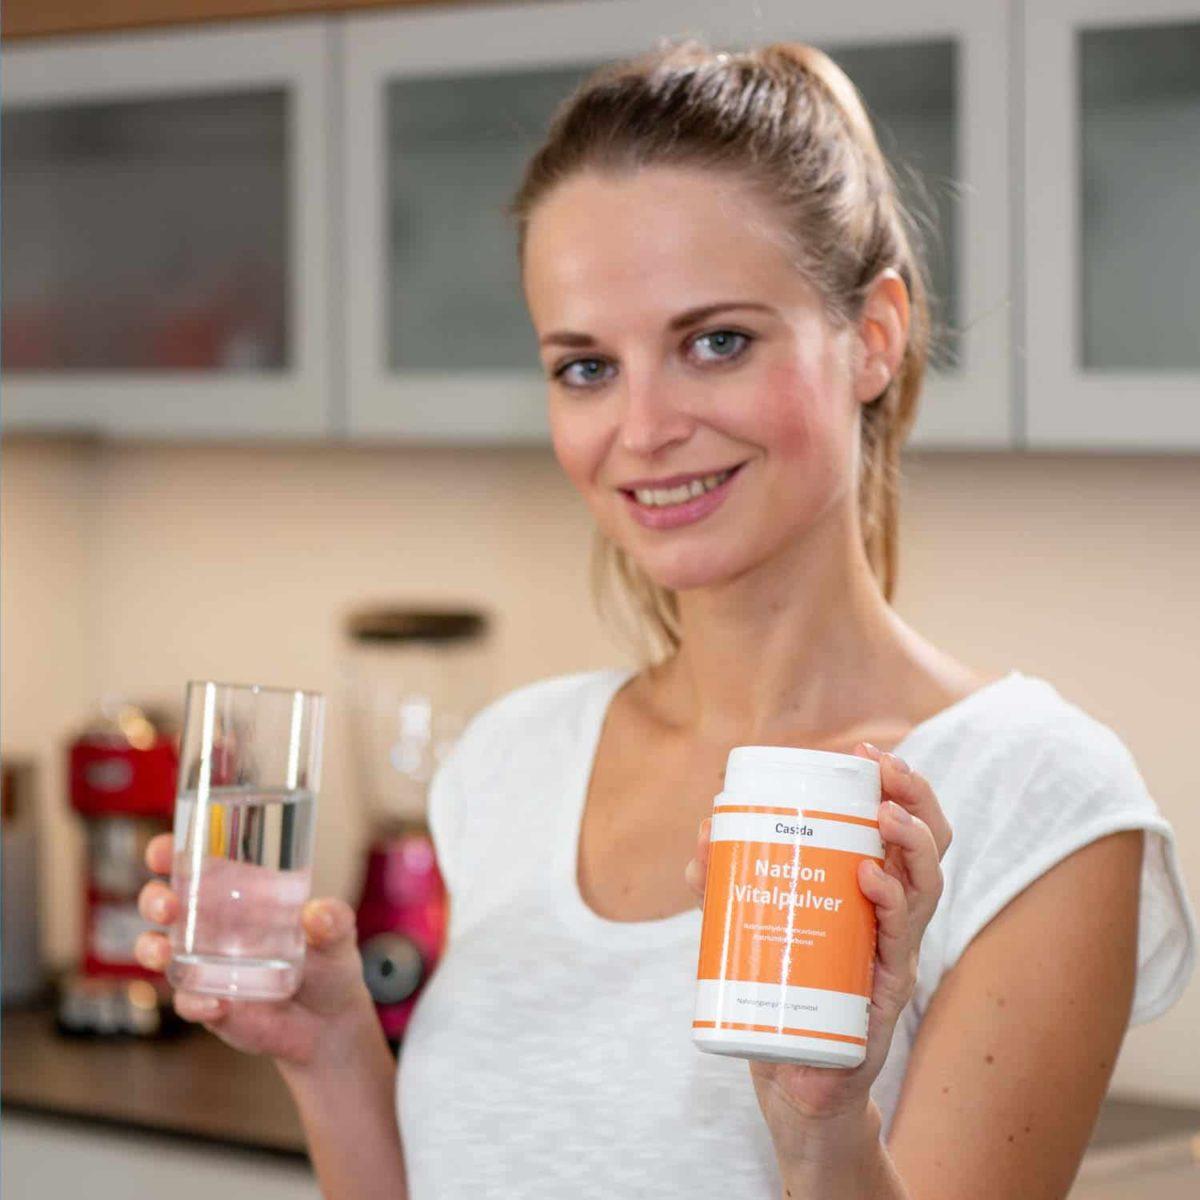 Casida Natron Vital Powder – 300 g 12464638 PZN Apotheke Basenkur trinken Lebensmittel8